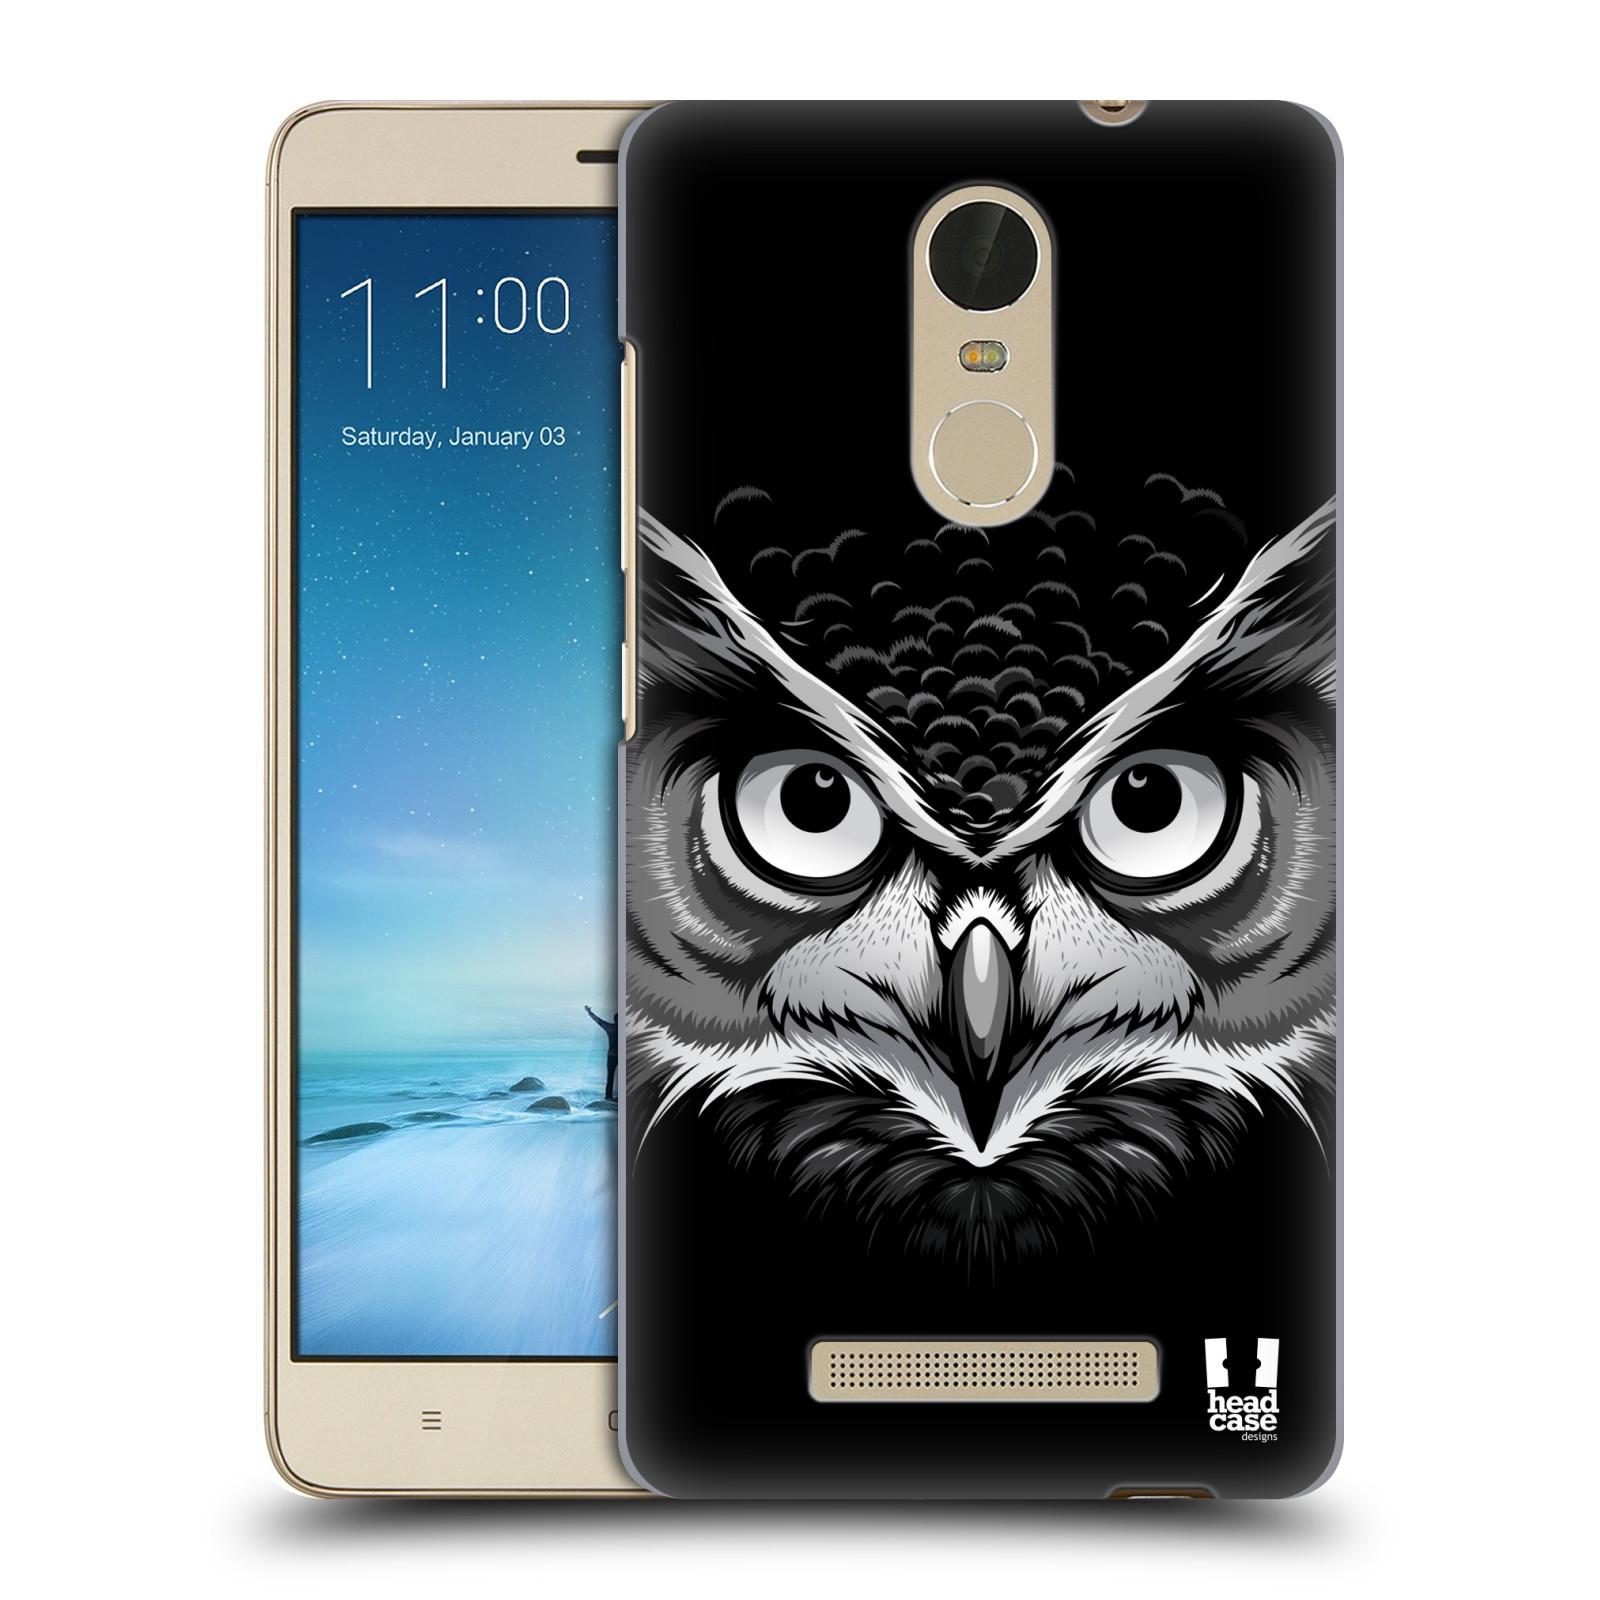 "Plastové pouzdro na mobil Xiaomi Redmi Note 3 HEAD CASE ILUSTROVANÁ SOVA (Kryt či obal na mobilní telefon Xiaomi Redmi Note 3 s 5,5"" displejem)"